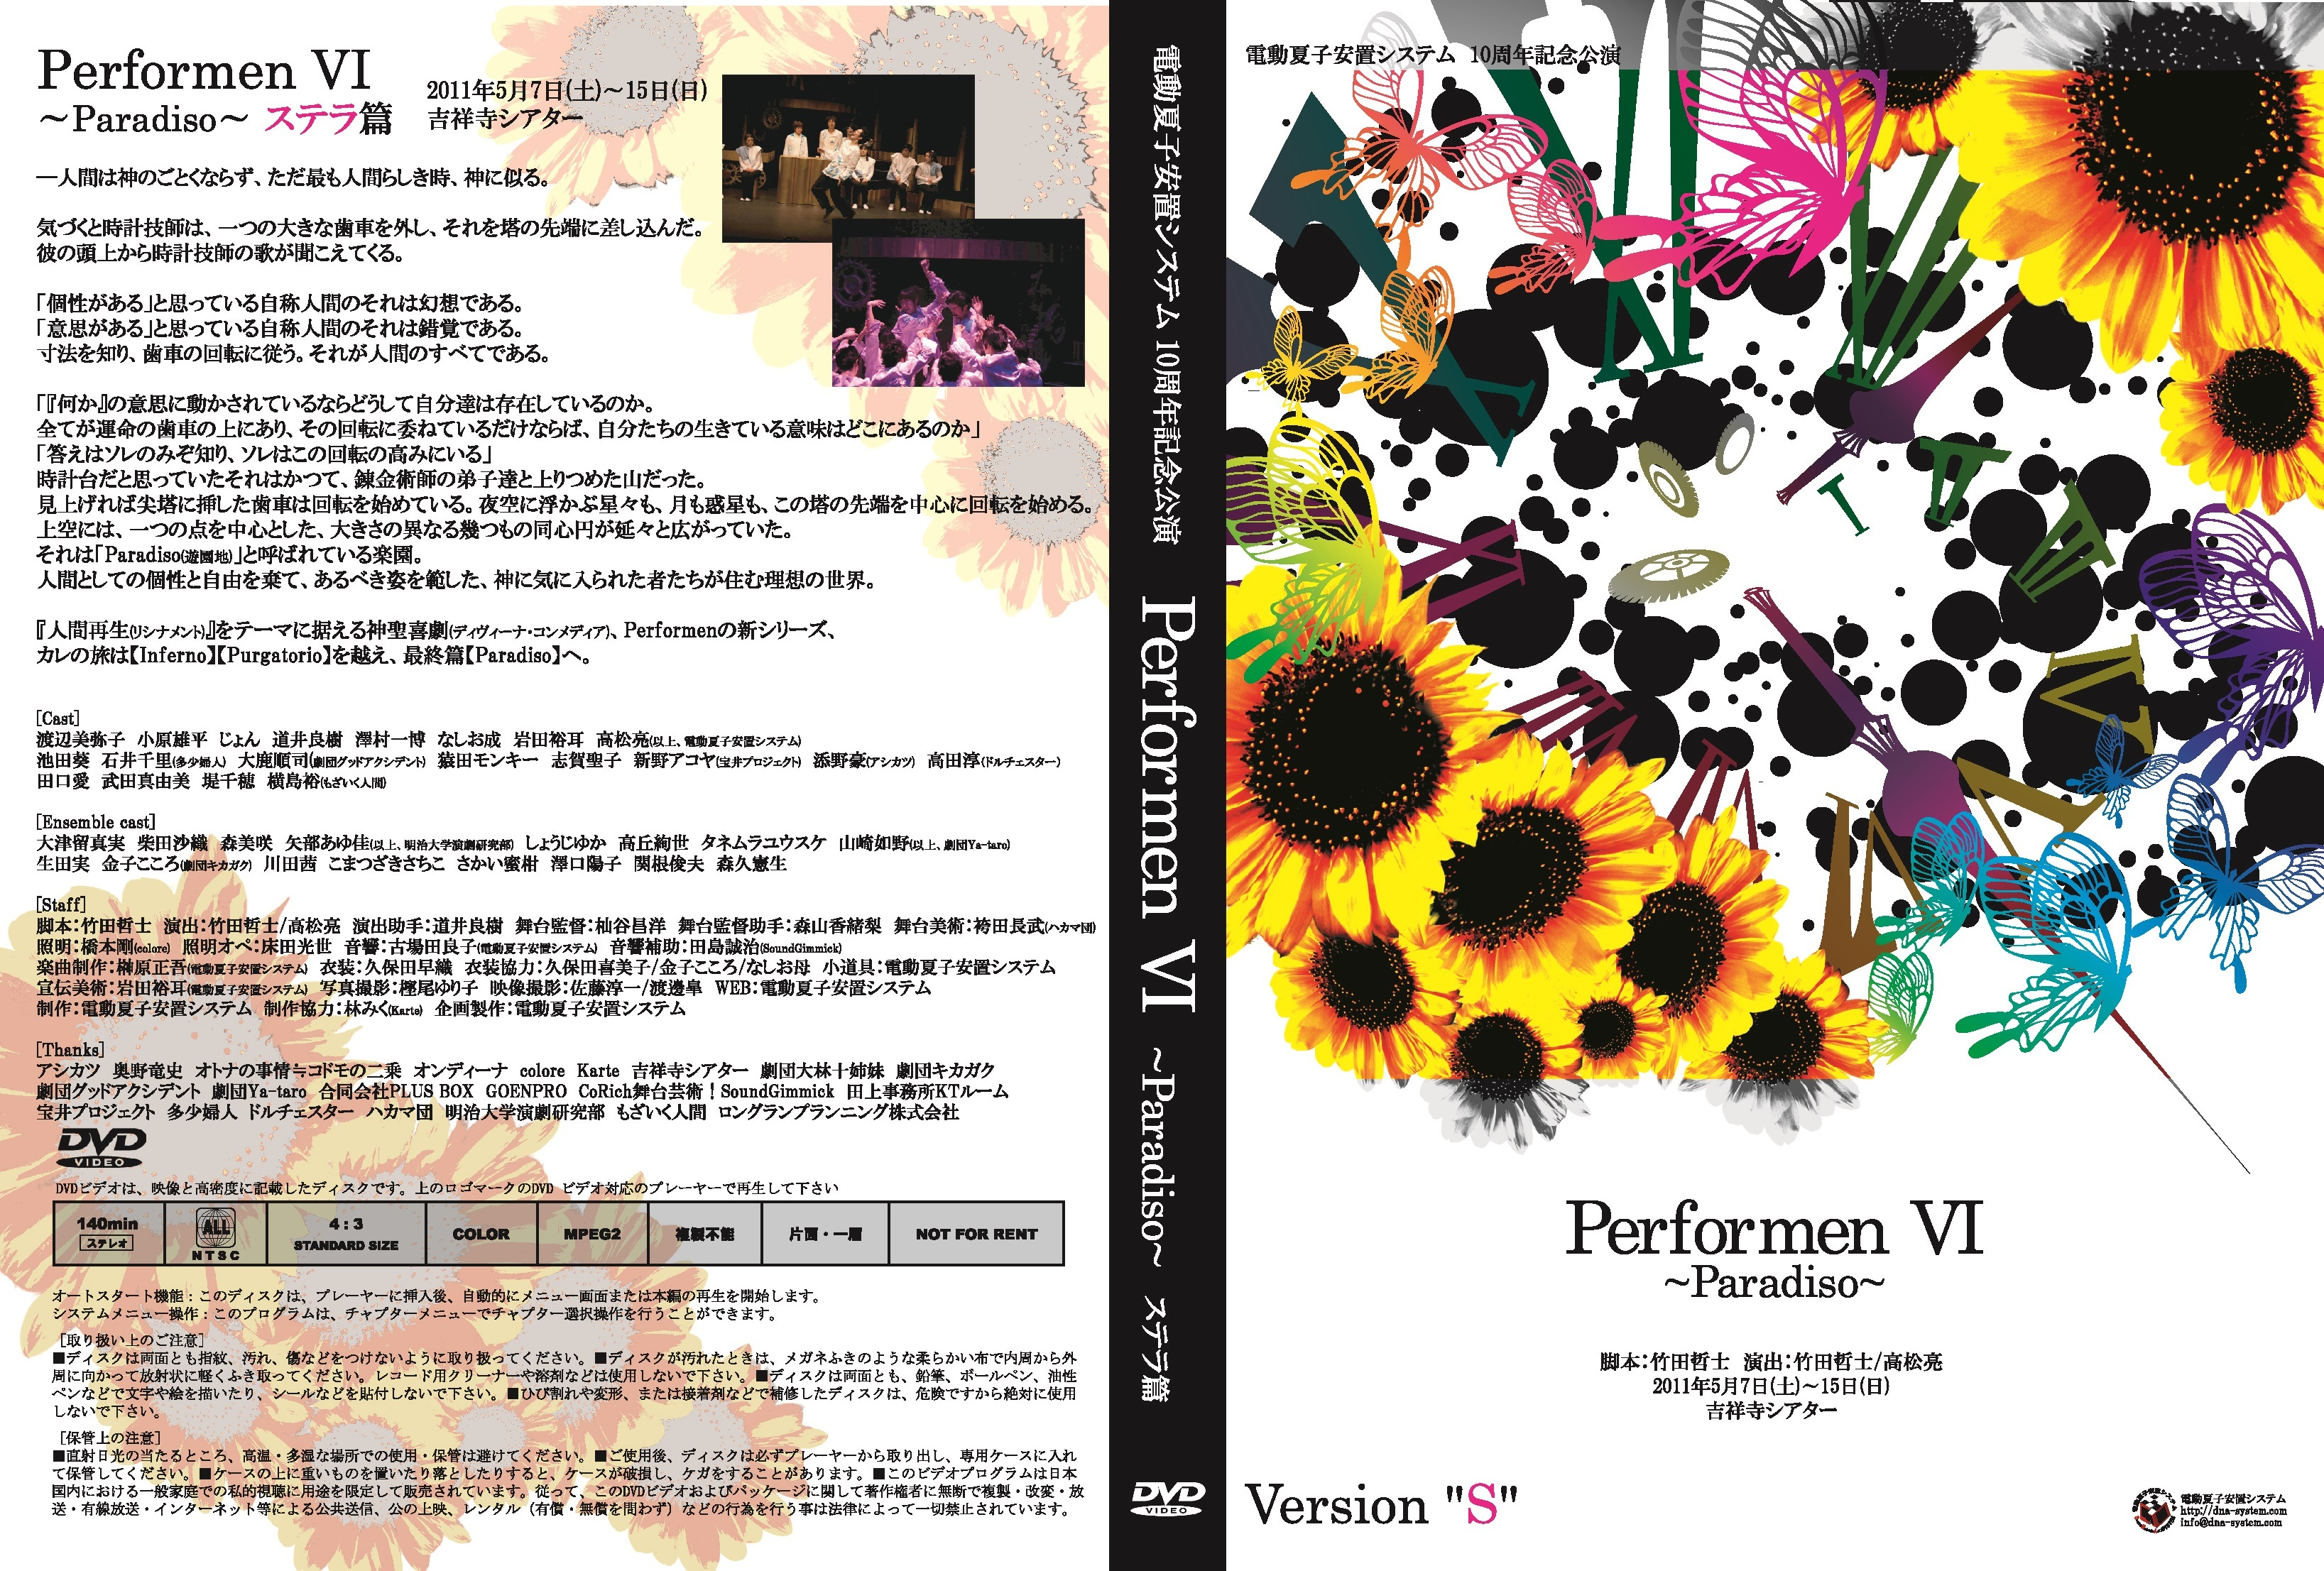 DVD 第25回公演『PerformenVI~Paradiso~』(ステラ編)